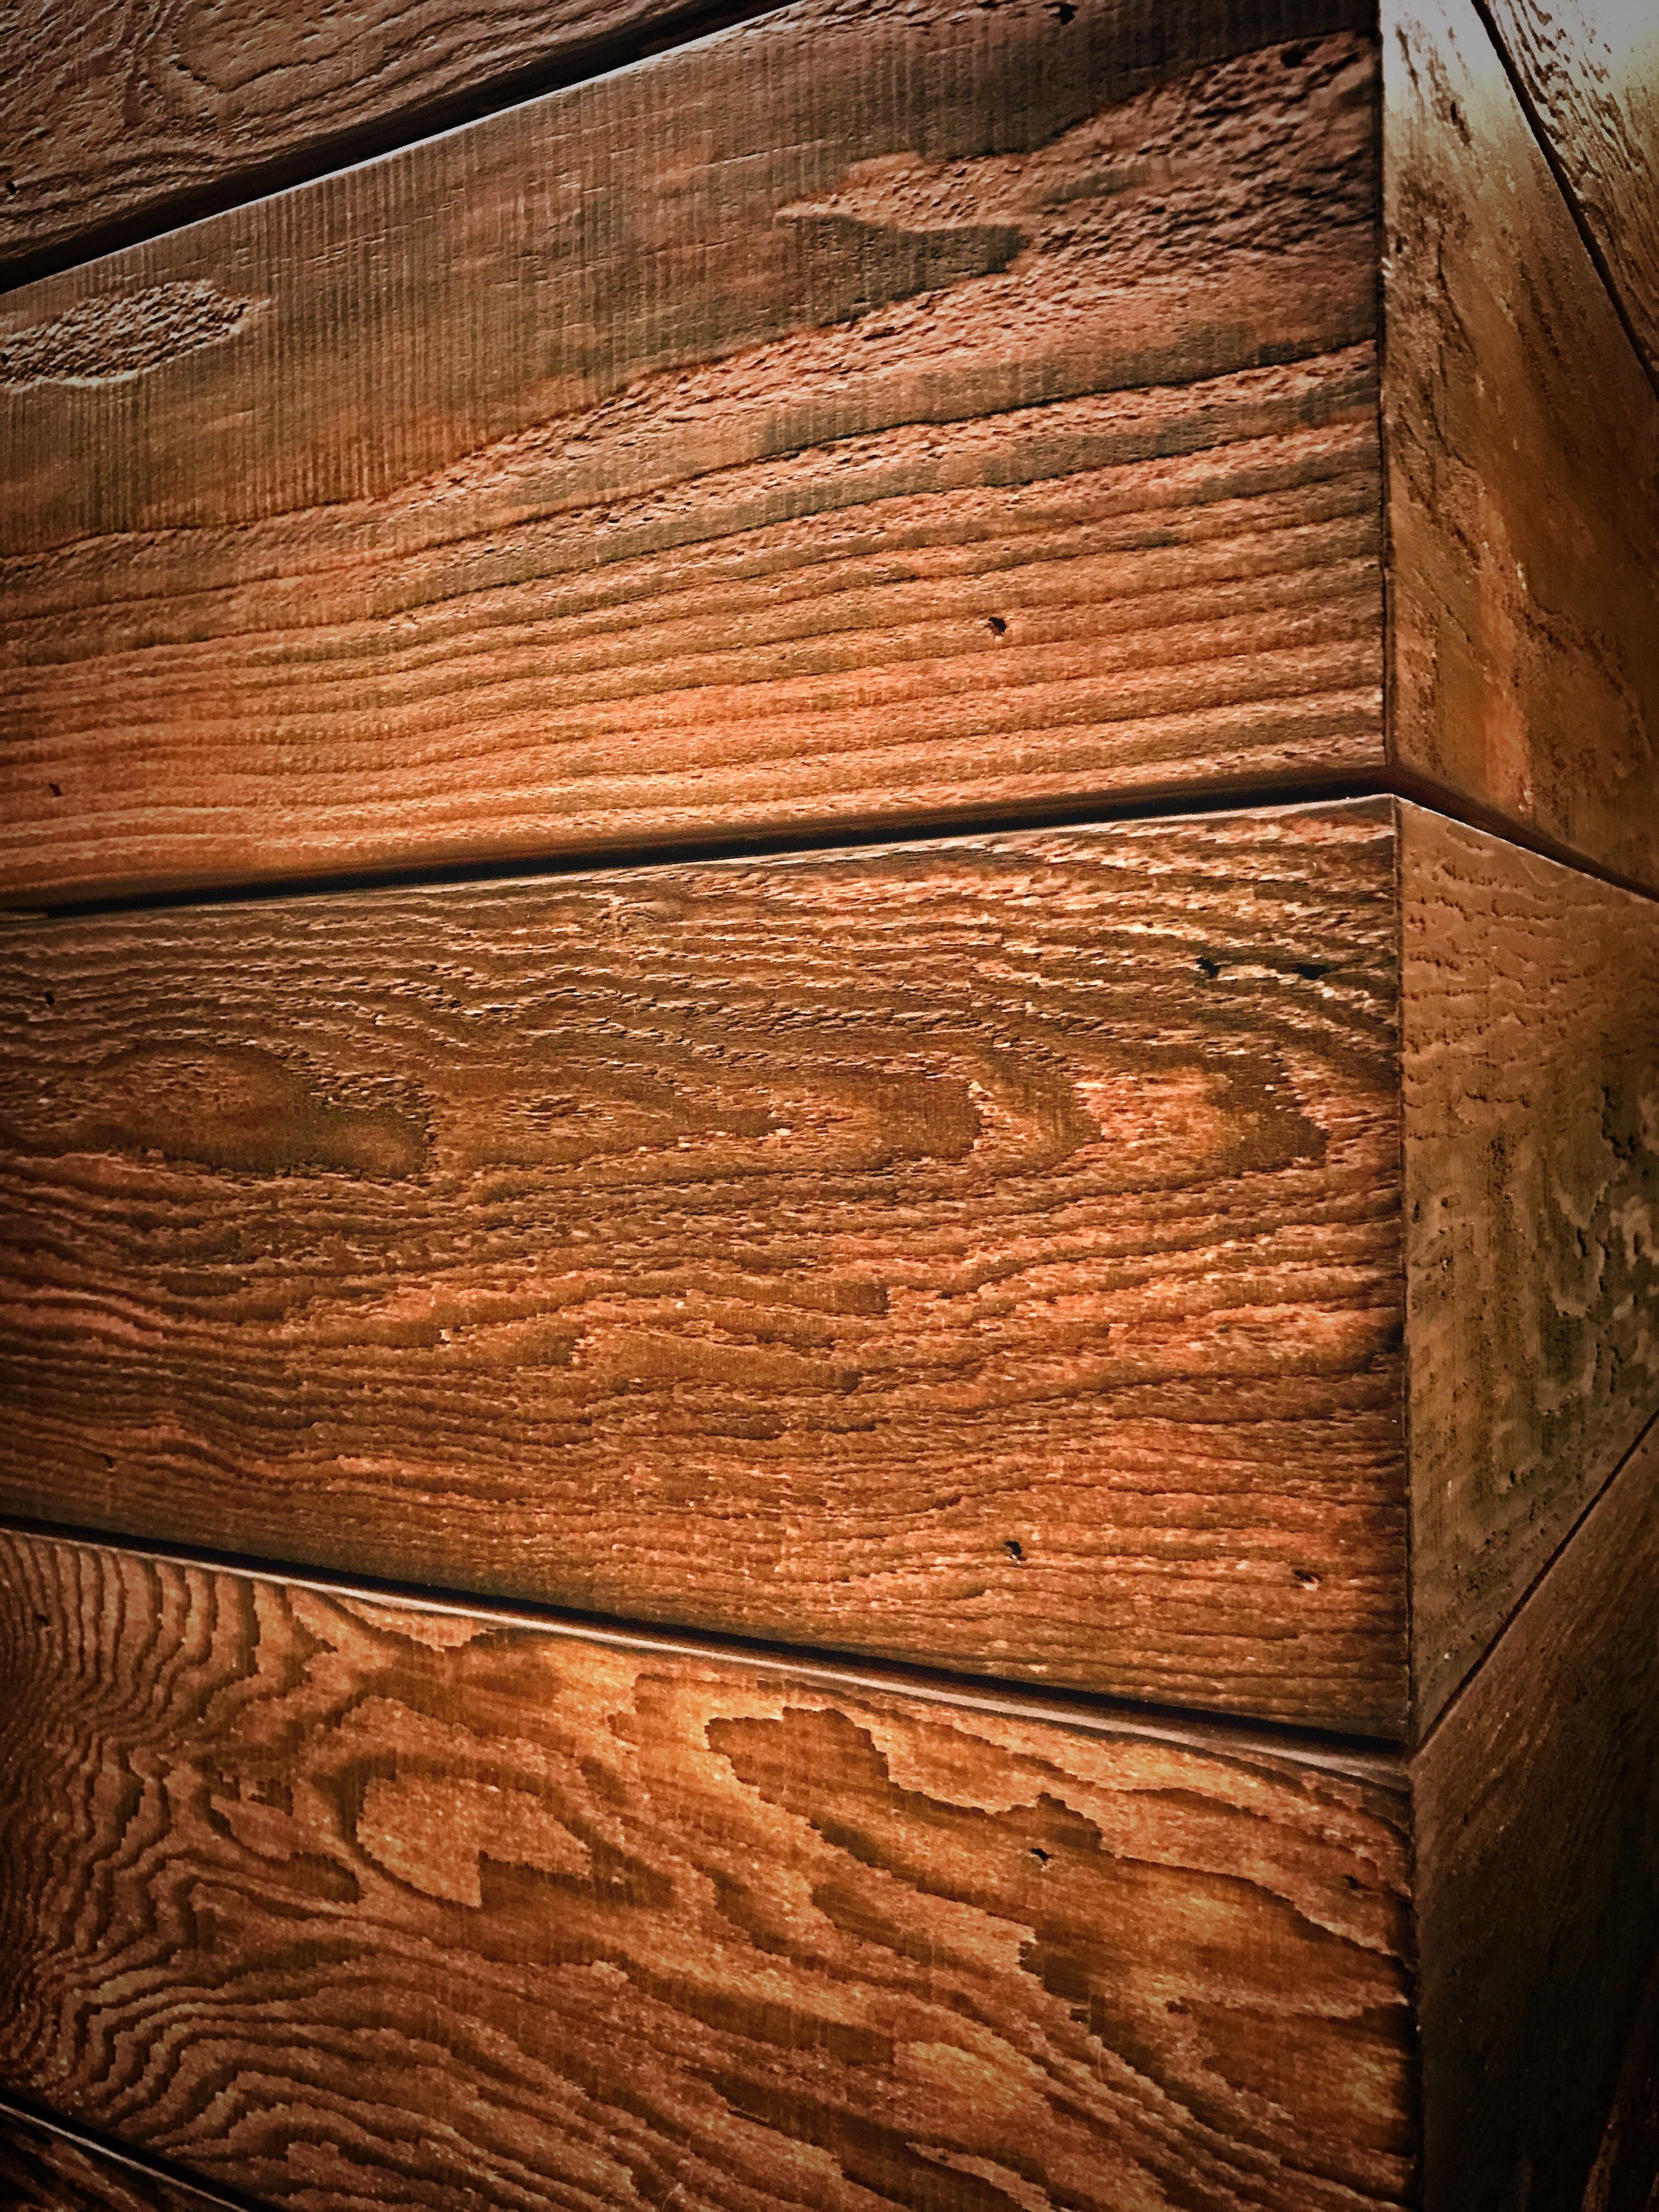 Holz Planke Stock Mauer Möbel Holz Hartholz Bodenbelag Sperrholz Holzboden  Mann Machte Objekt Laminatboden Holzbeize